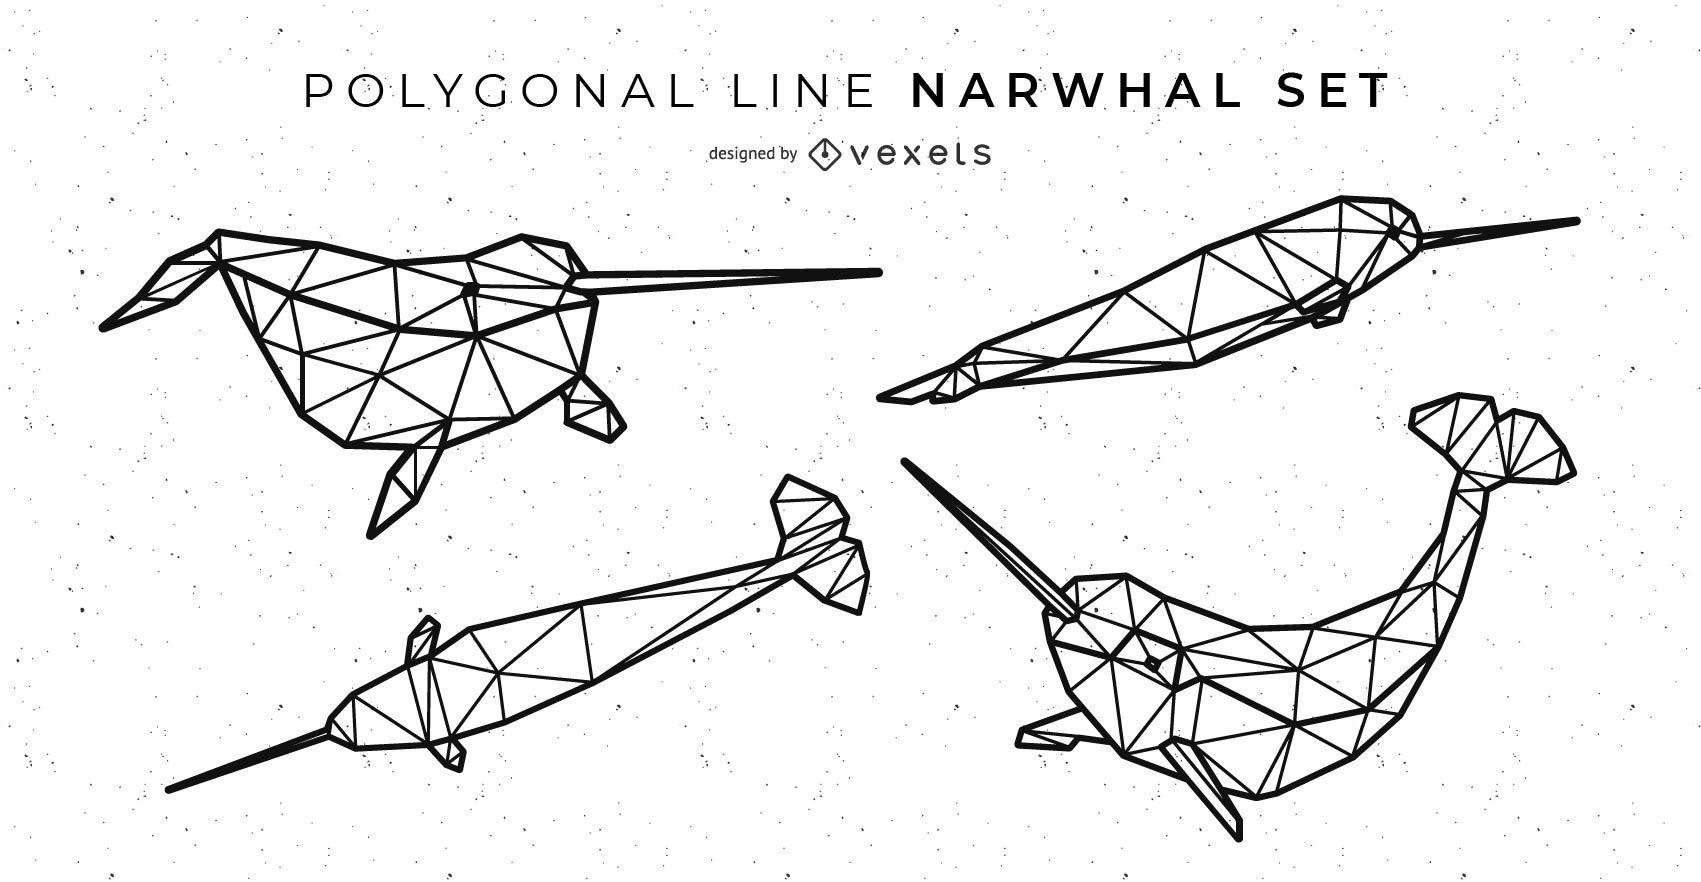 Polygonal Line Narwhal Set